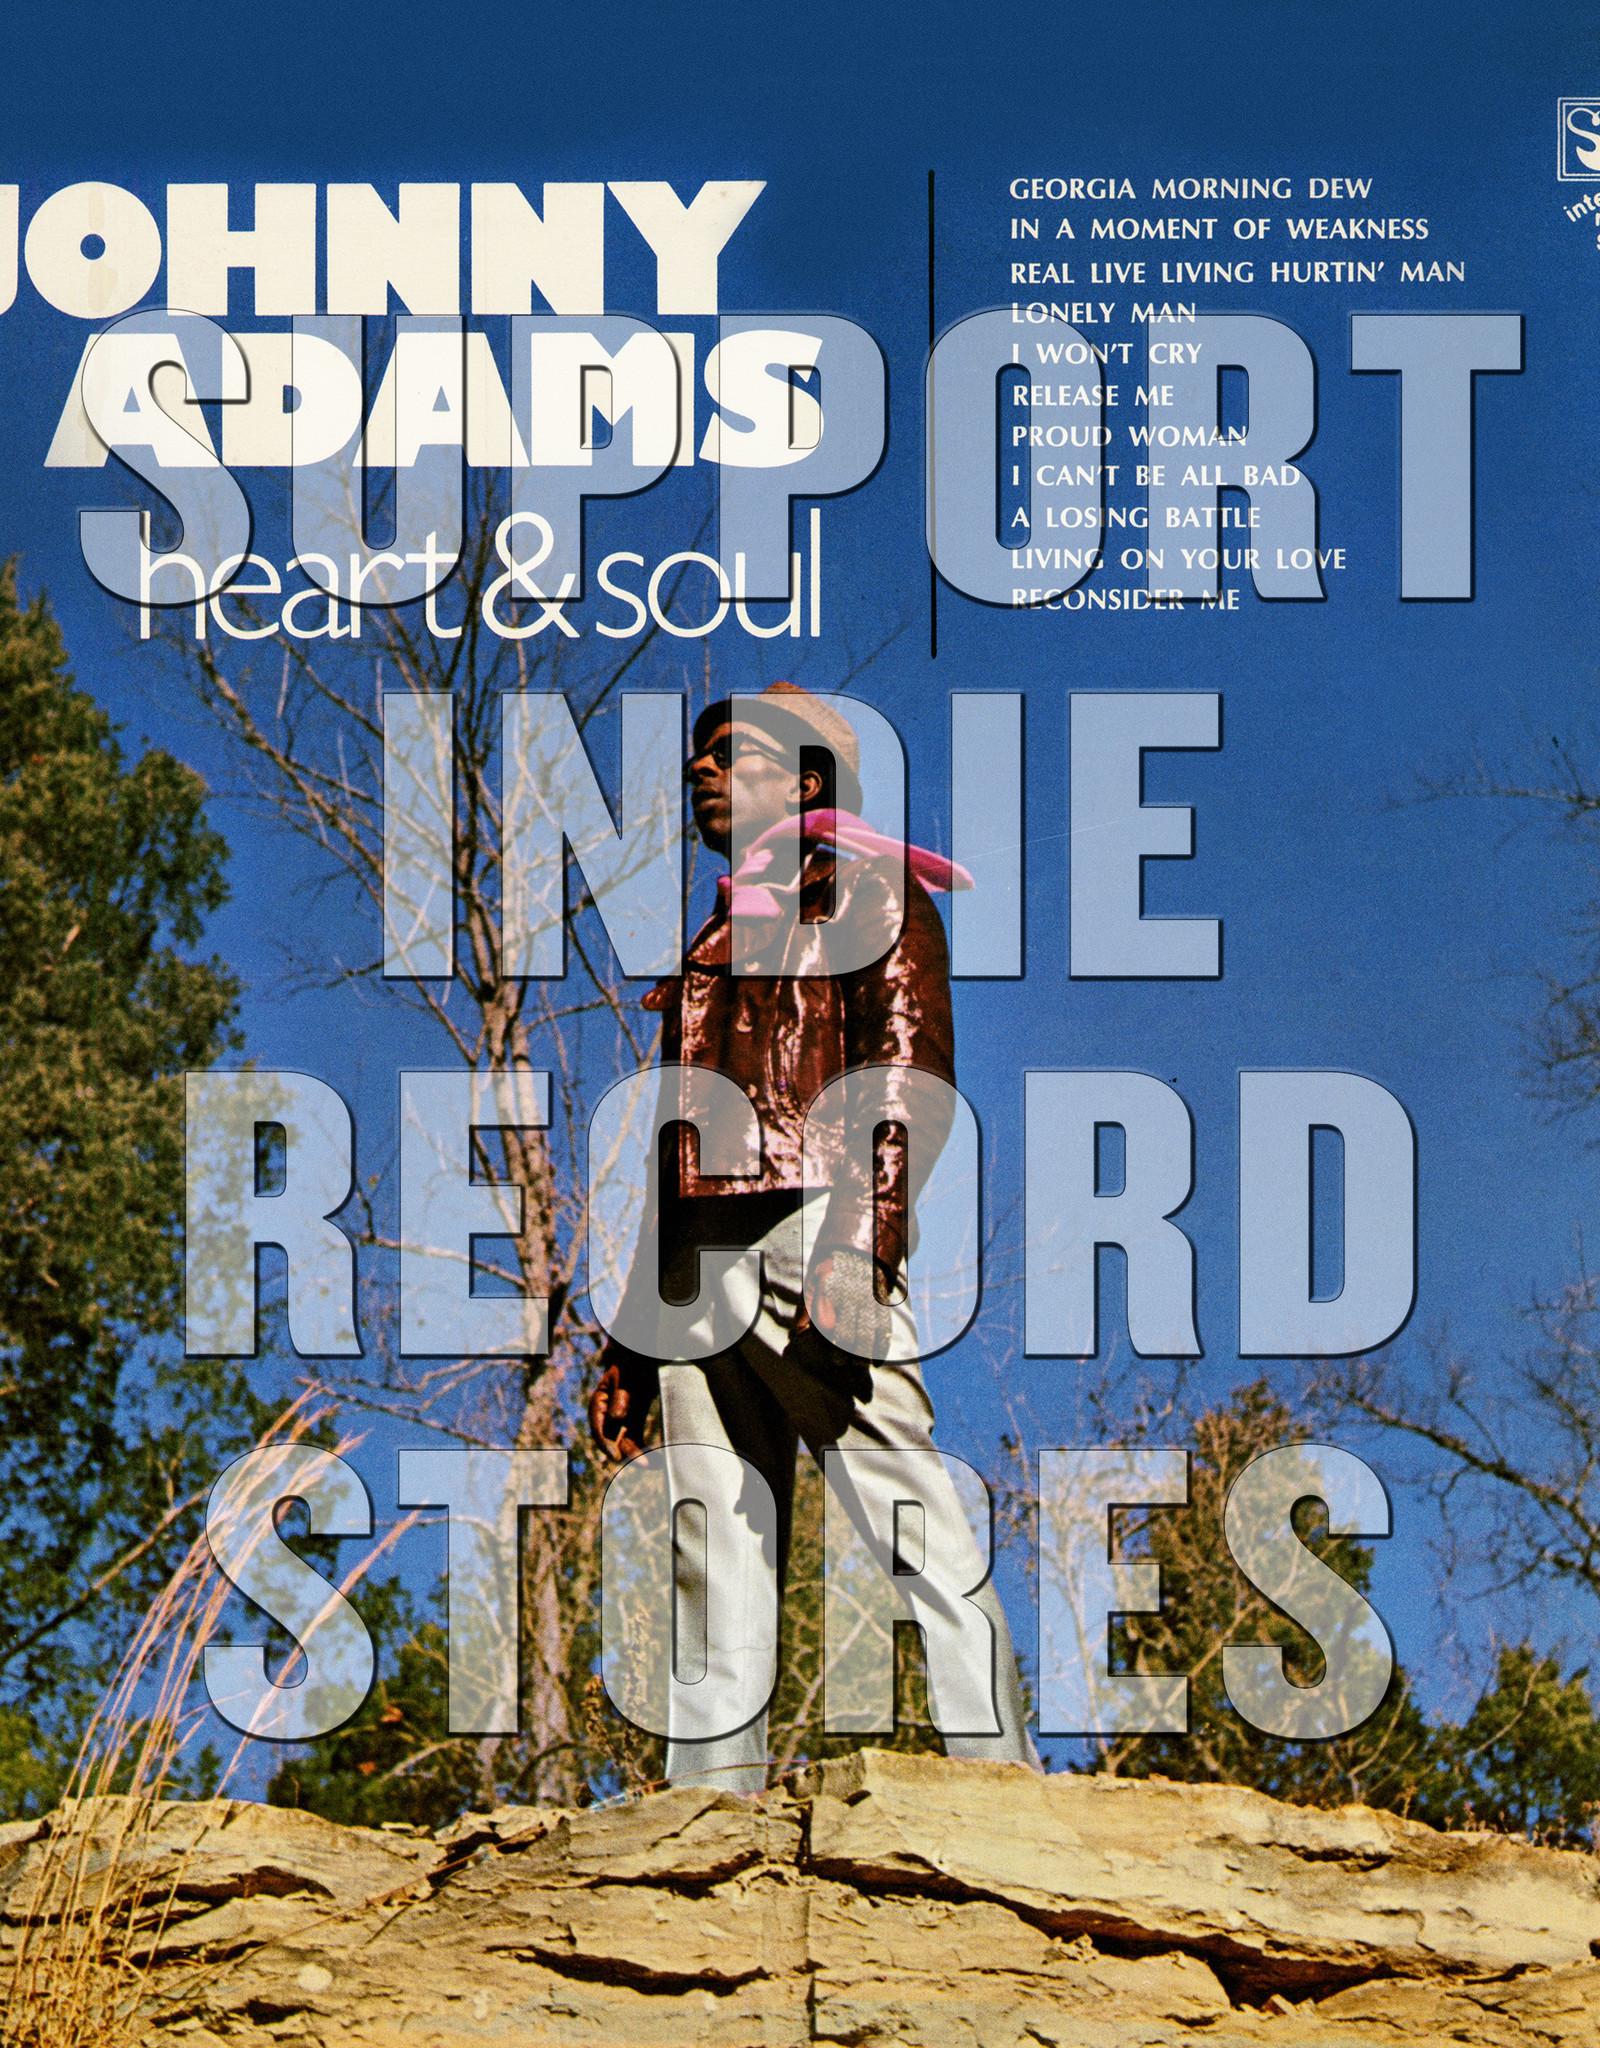 Johnny Adams - Heart & Soul (RSD 2019)